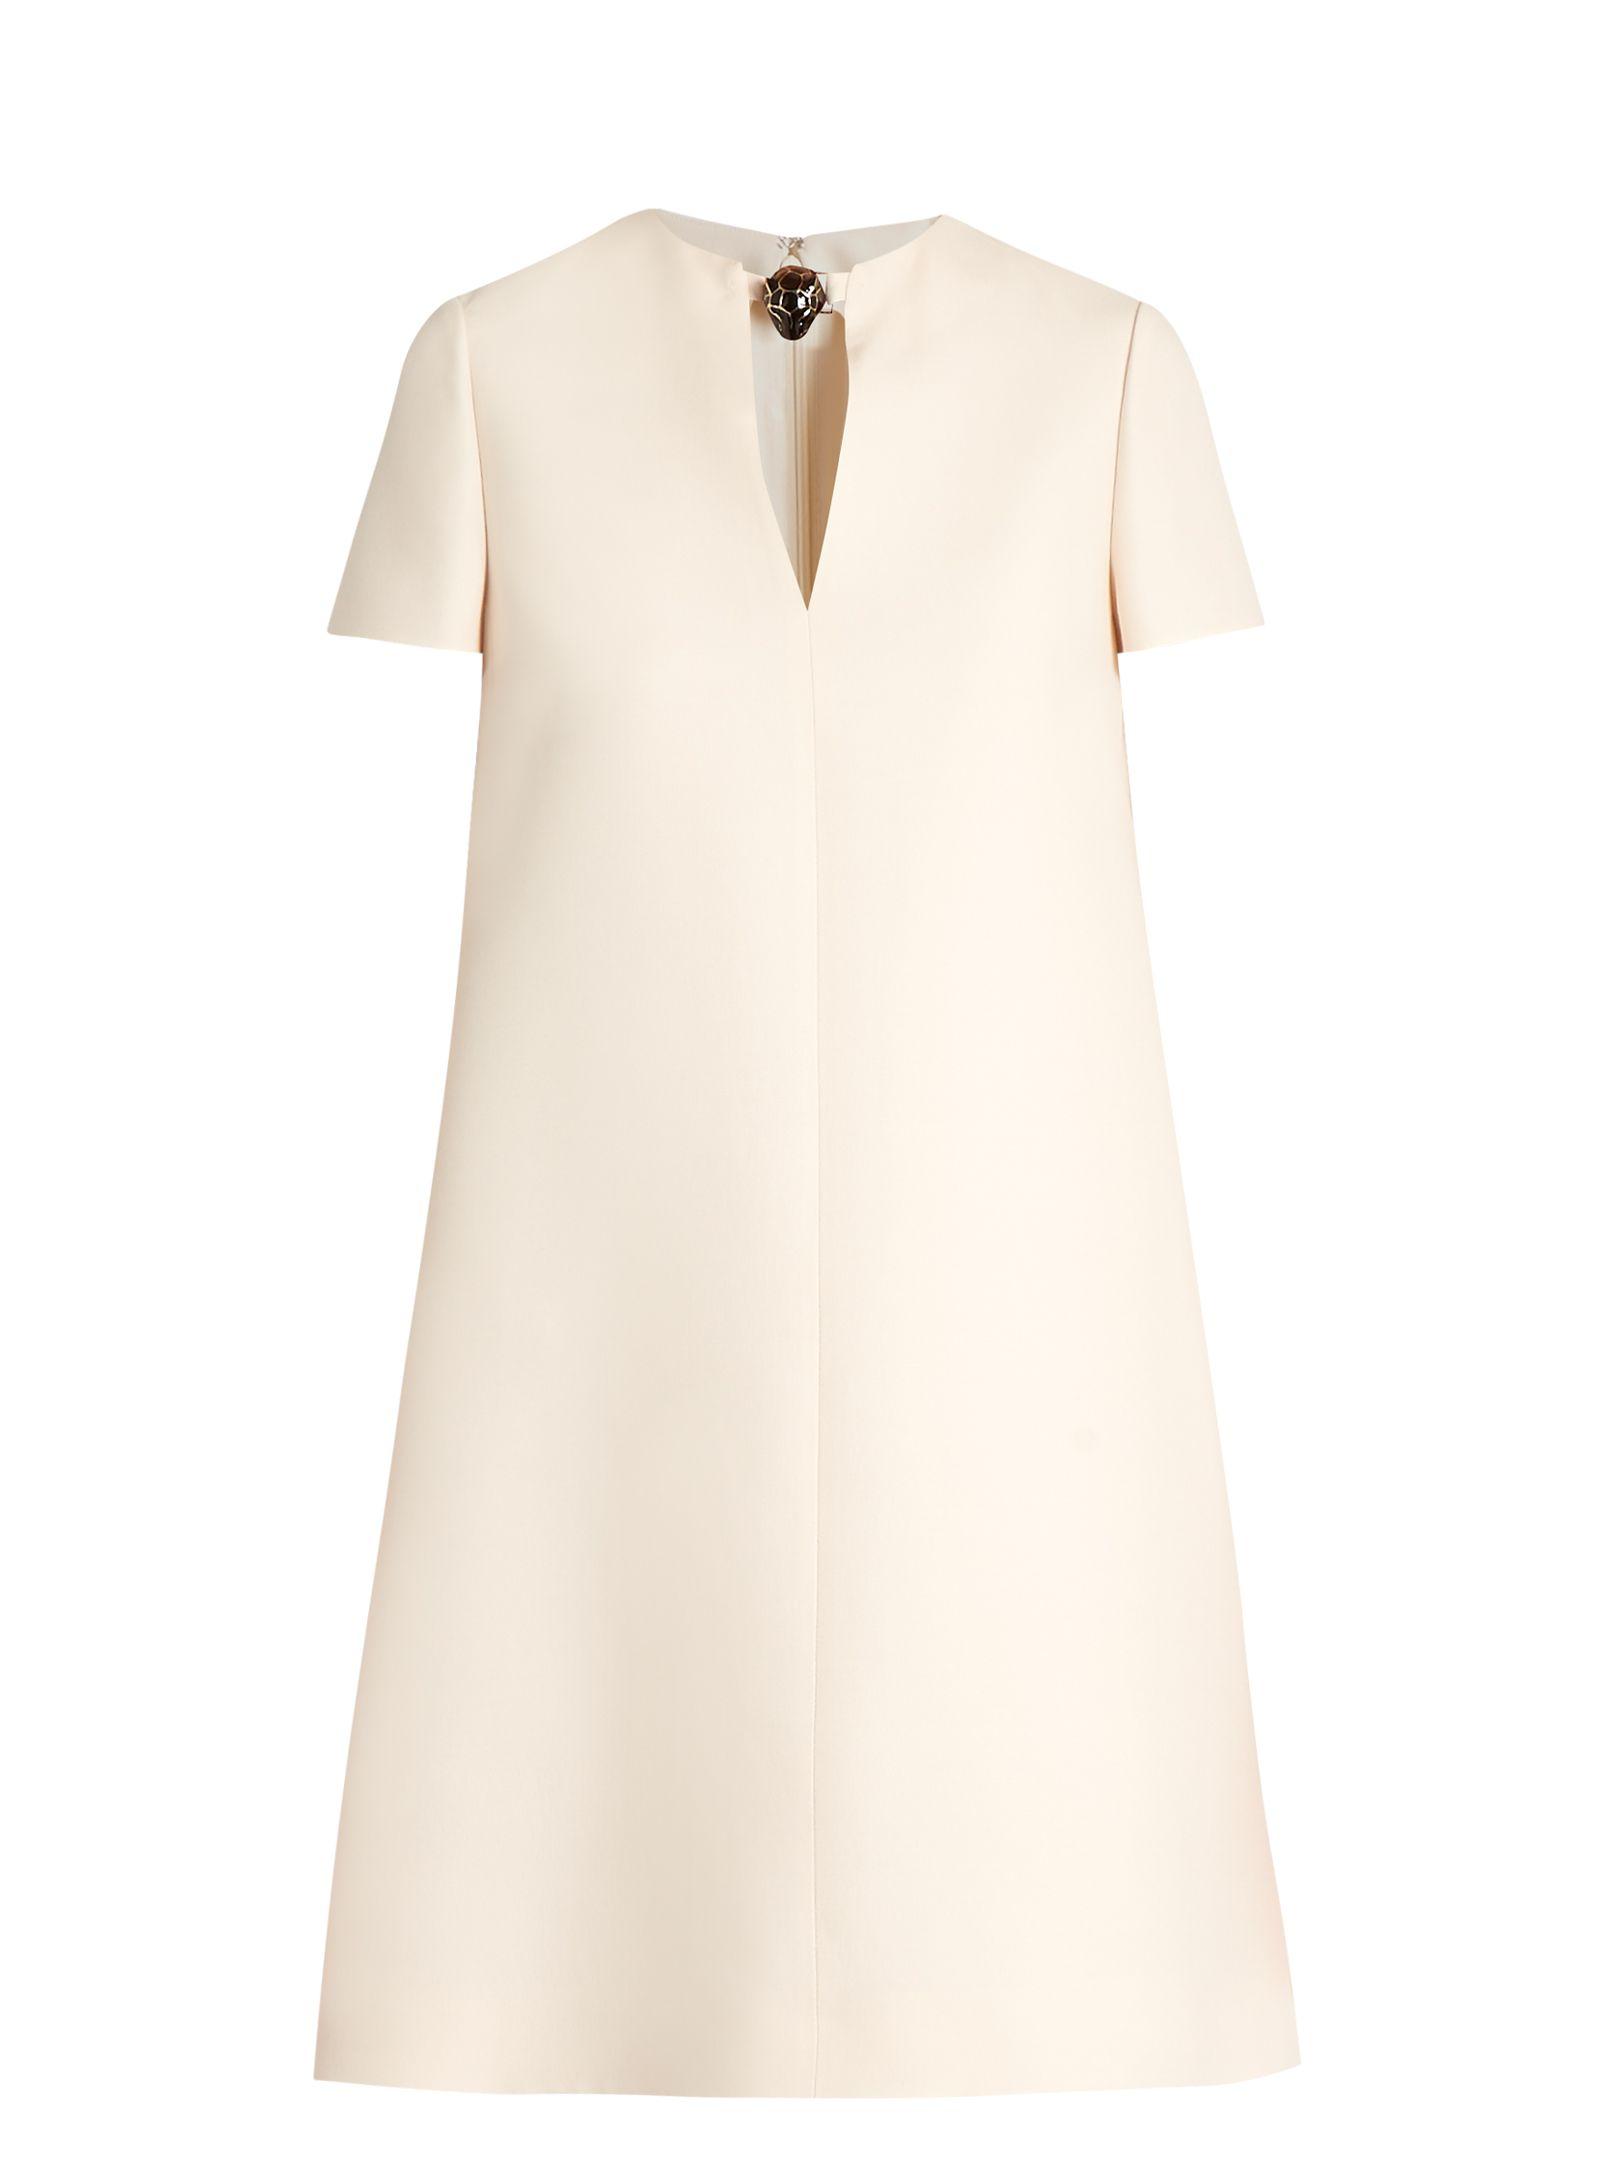 Valentino Woman Paneled Pleated Silk Crepe De Chine Mini Dress Antique Rose Size 44 Valentino 0d0QLa